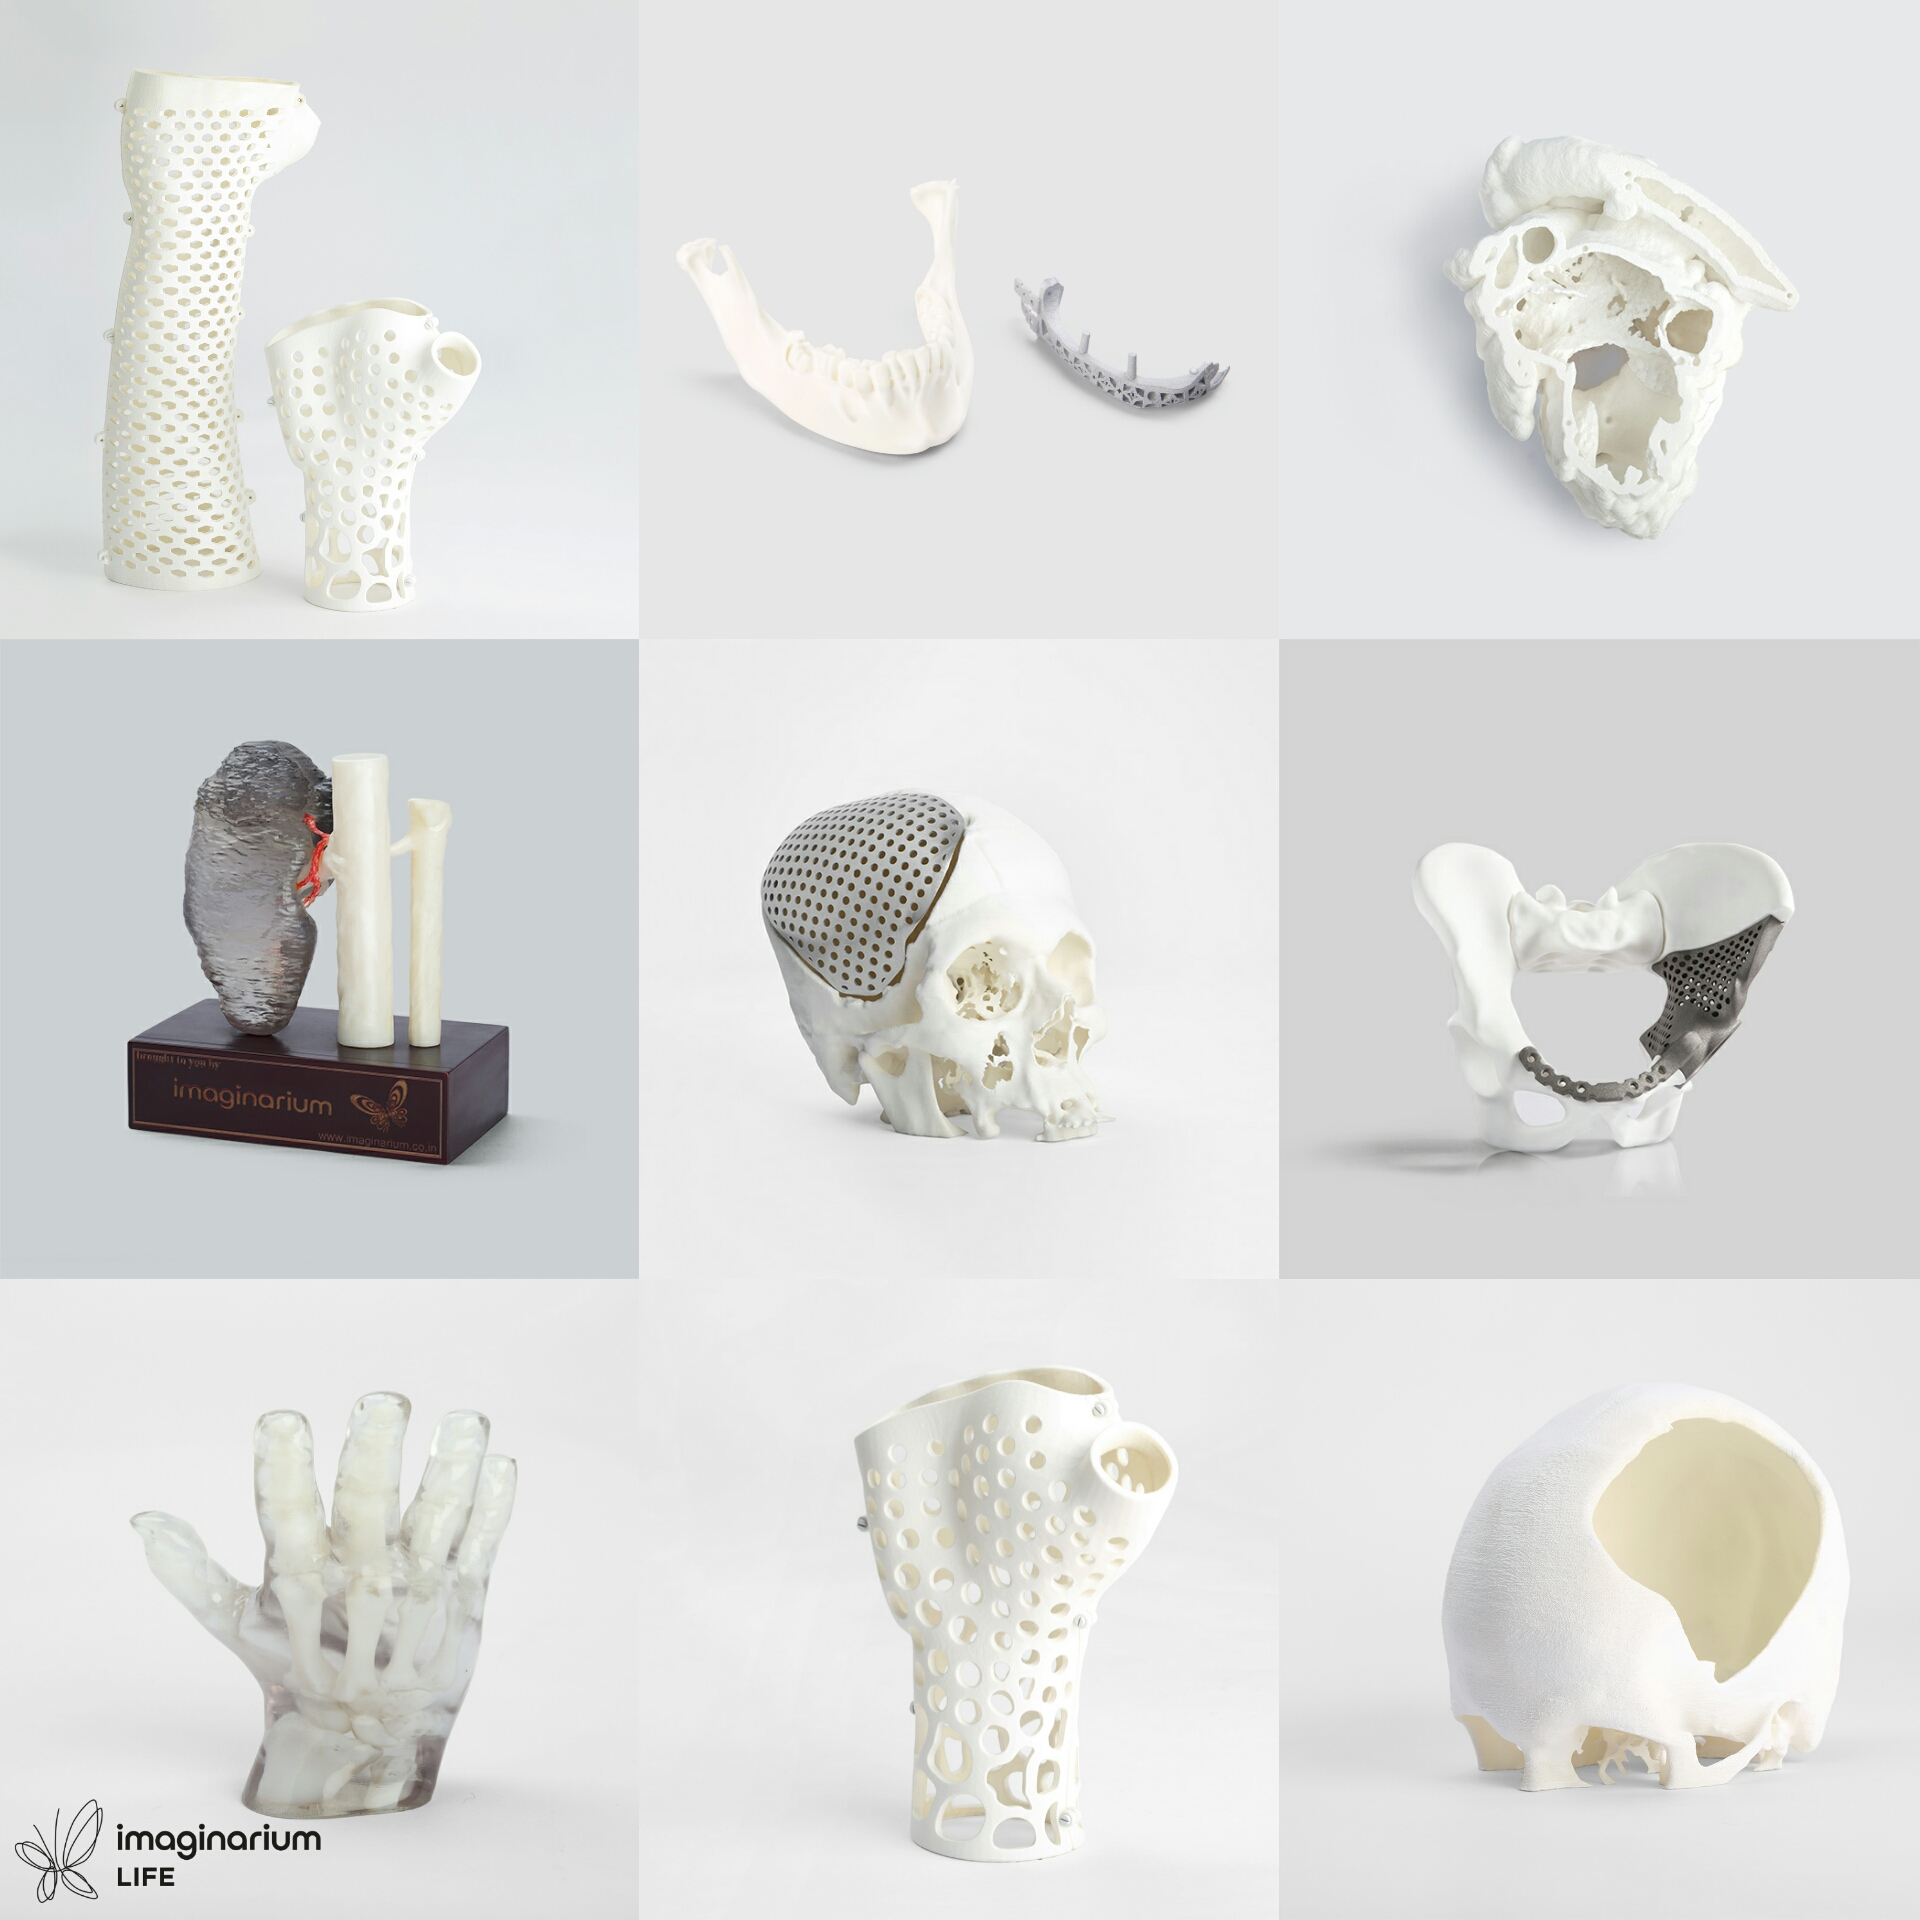 Imaginarium Life 3D Printing Medical